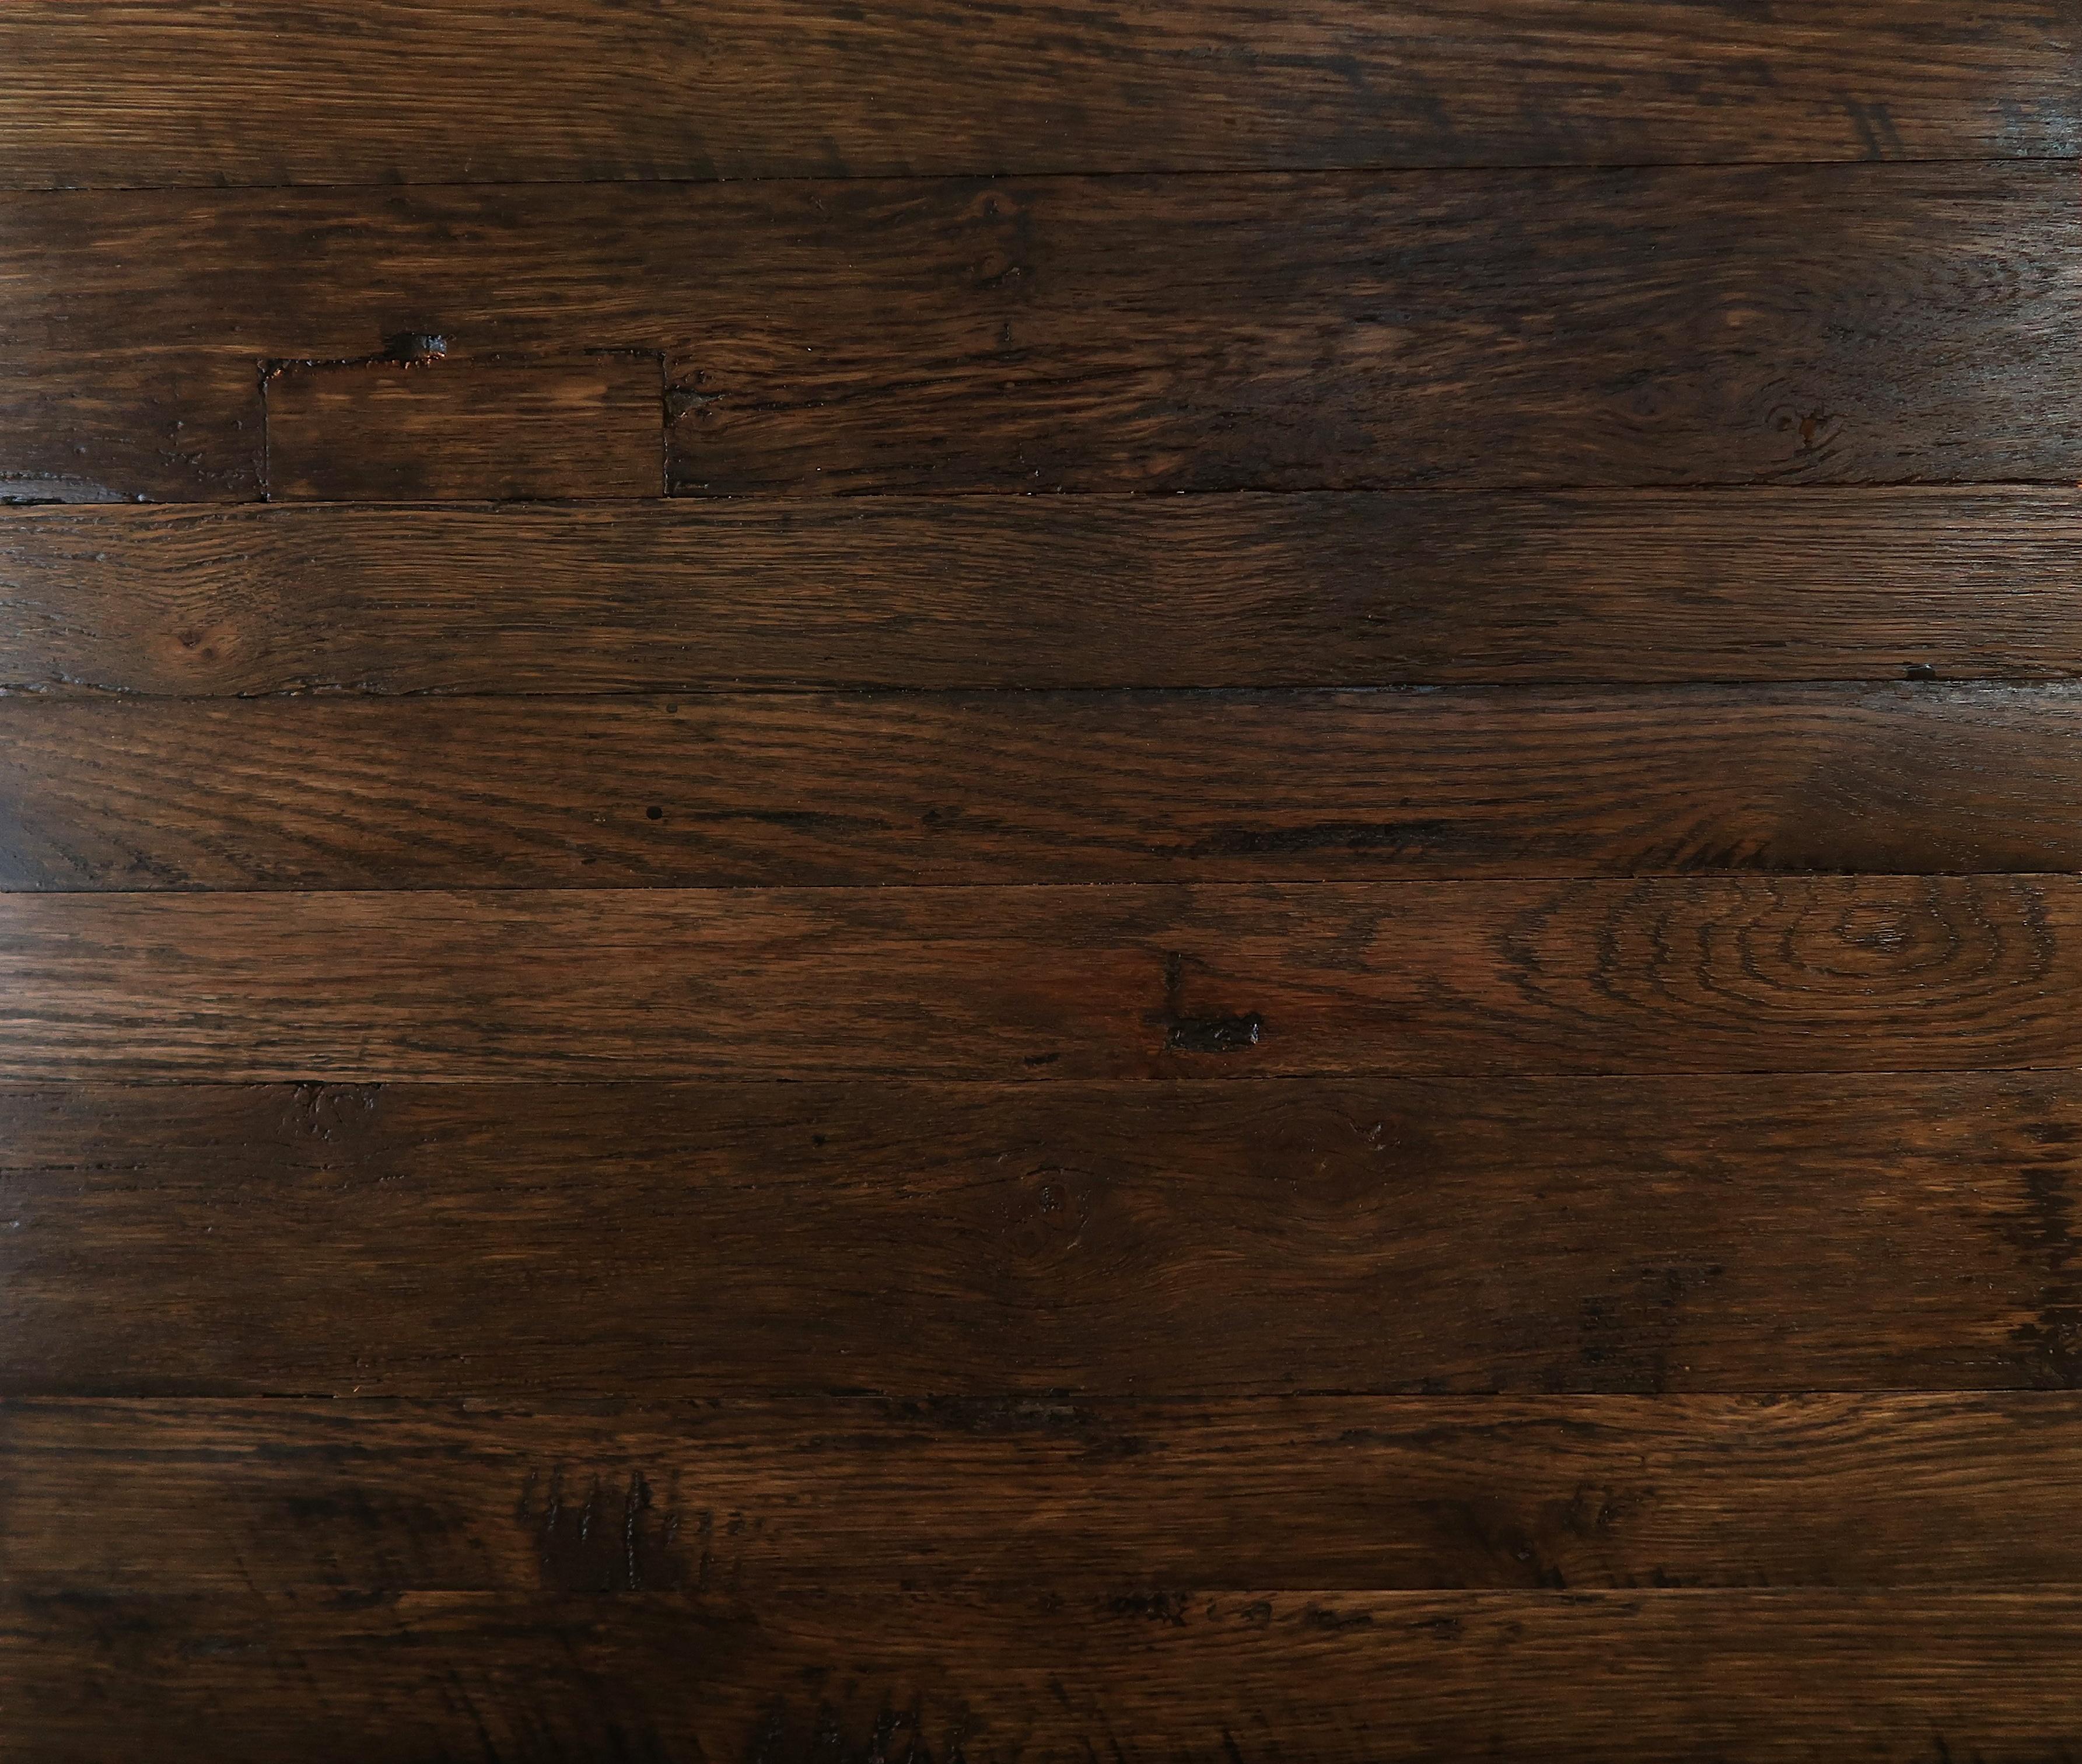 New England Oak – Antique Brown